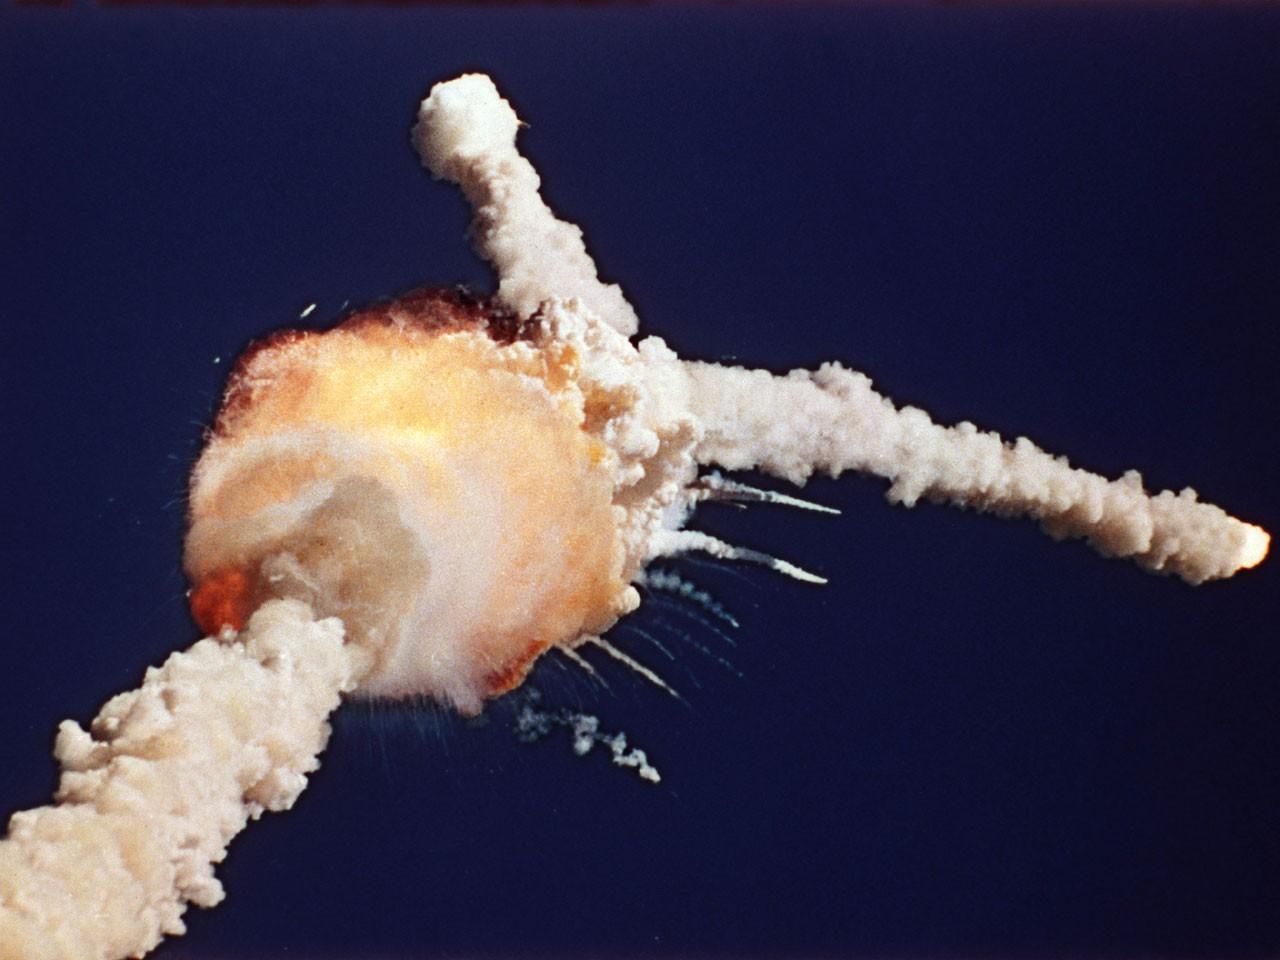 Space Shuttle Challenger, 28 января 1986 года.